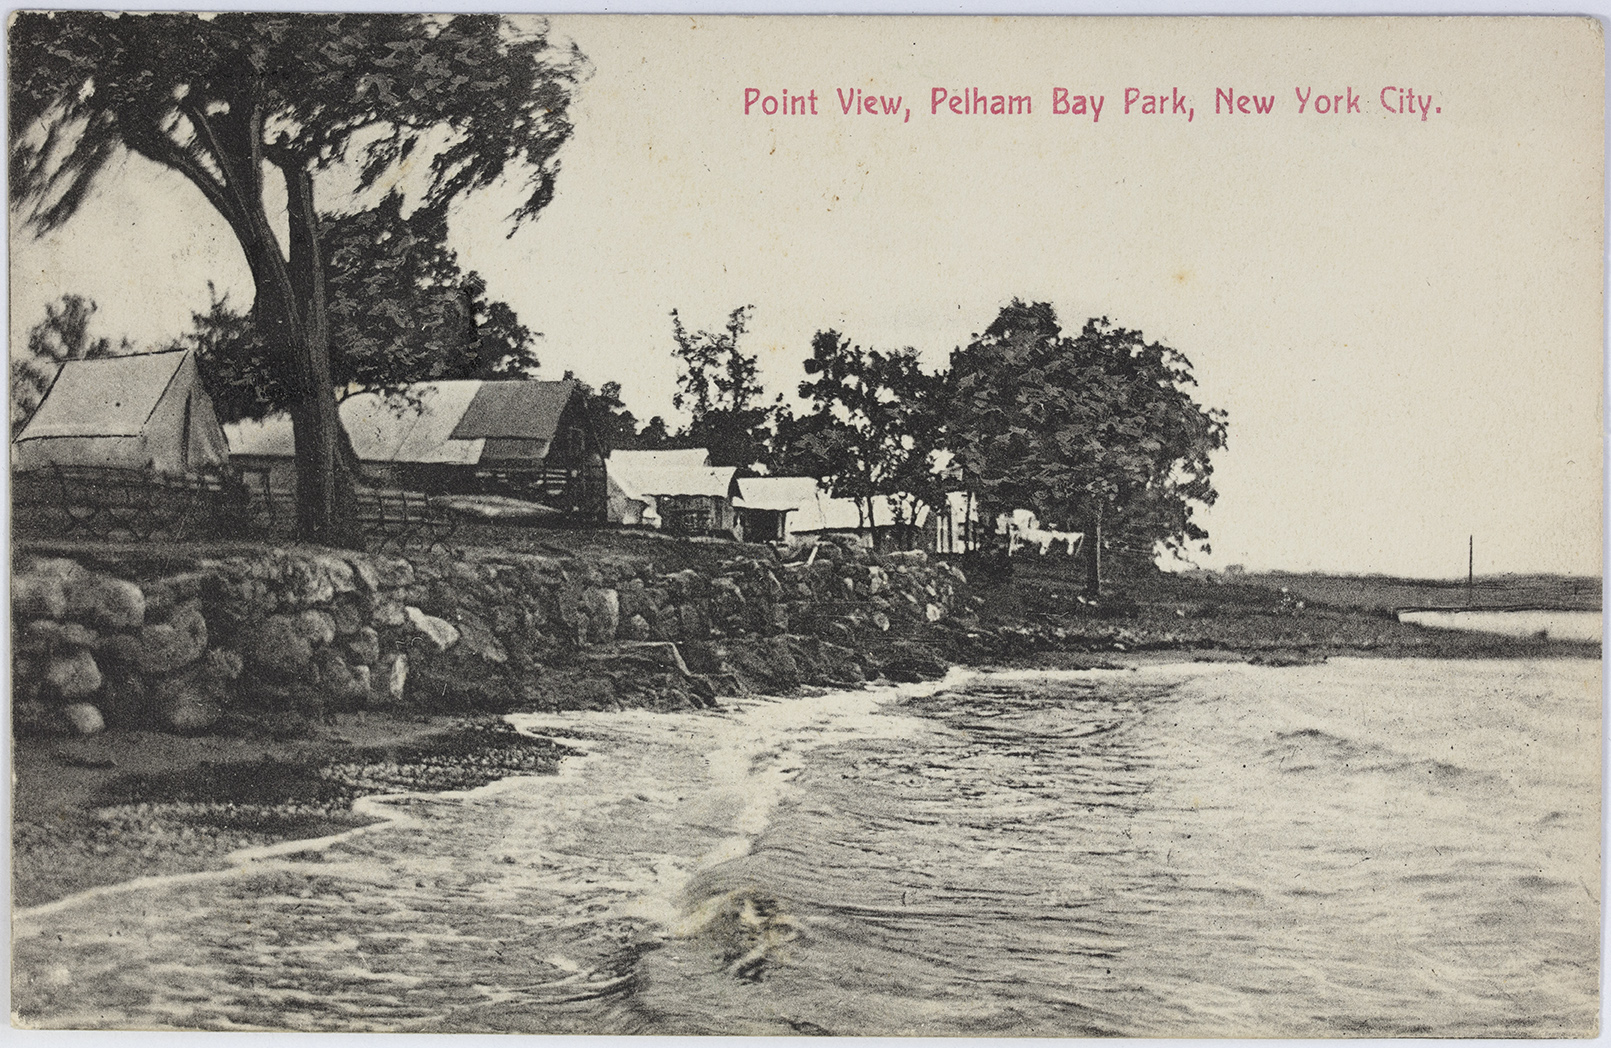 Point View, Pelham Bay Postcard.jpg